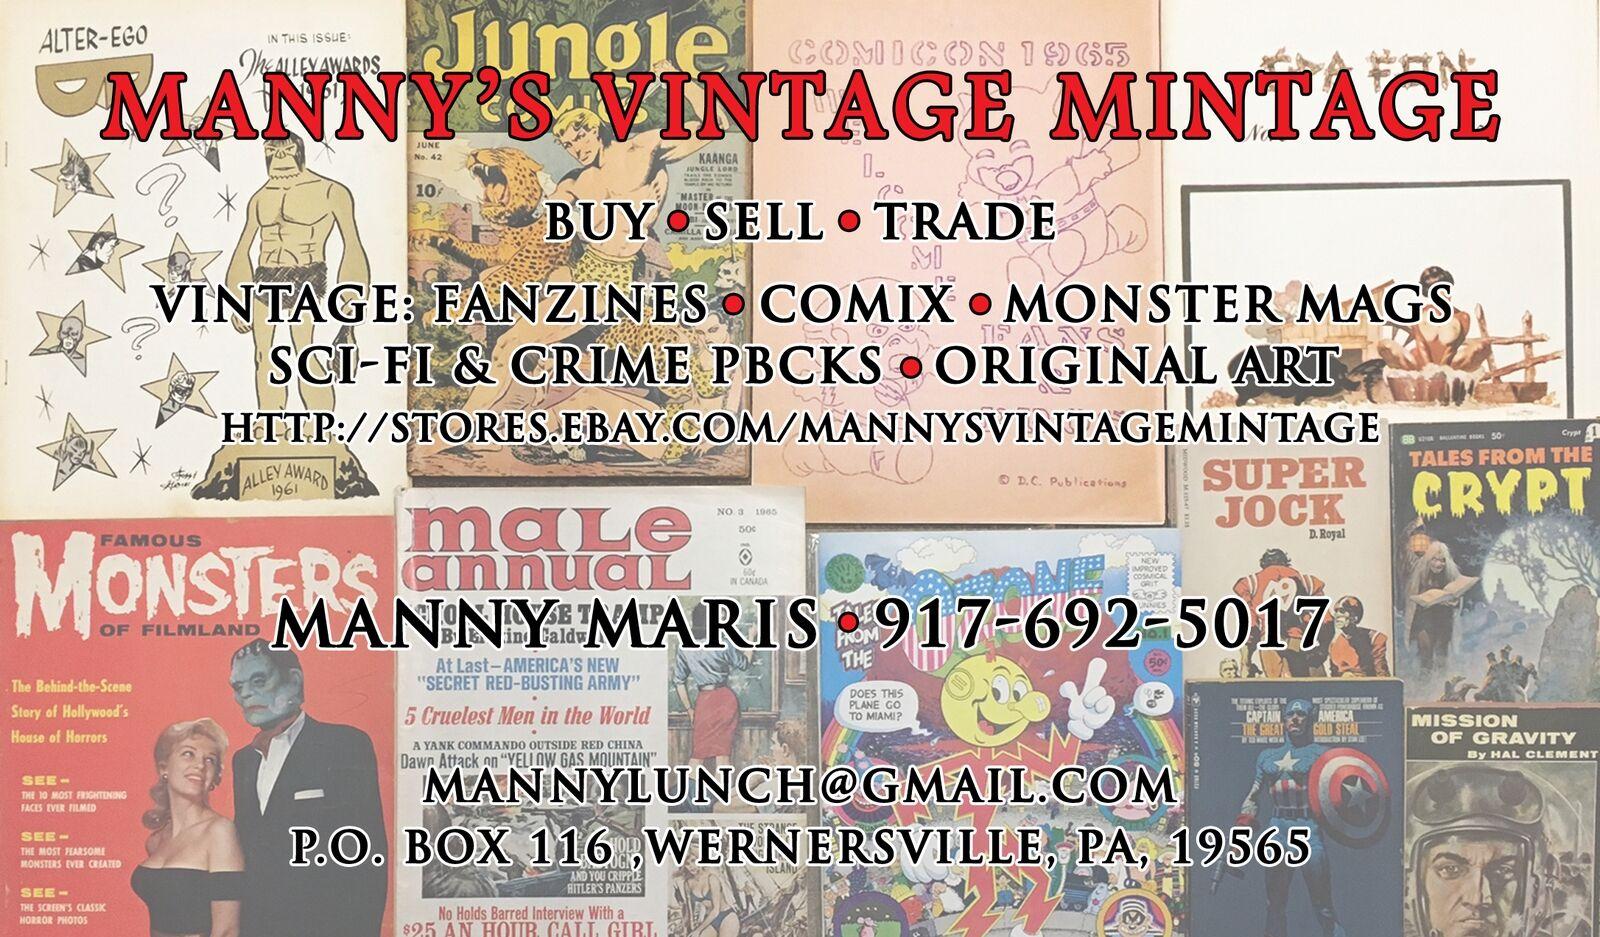 Manny's Vintage Mintage